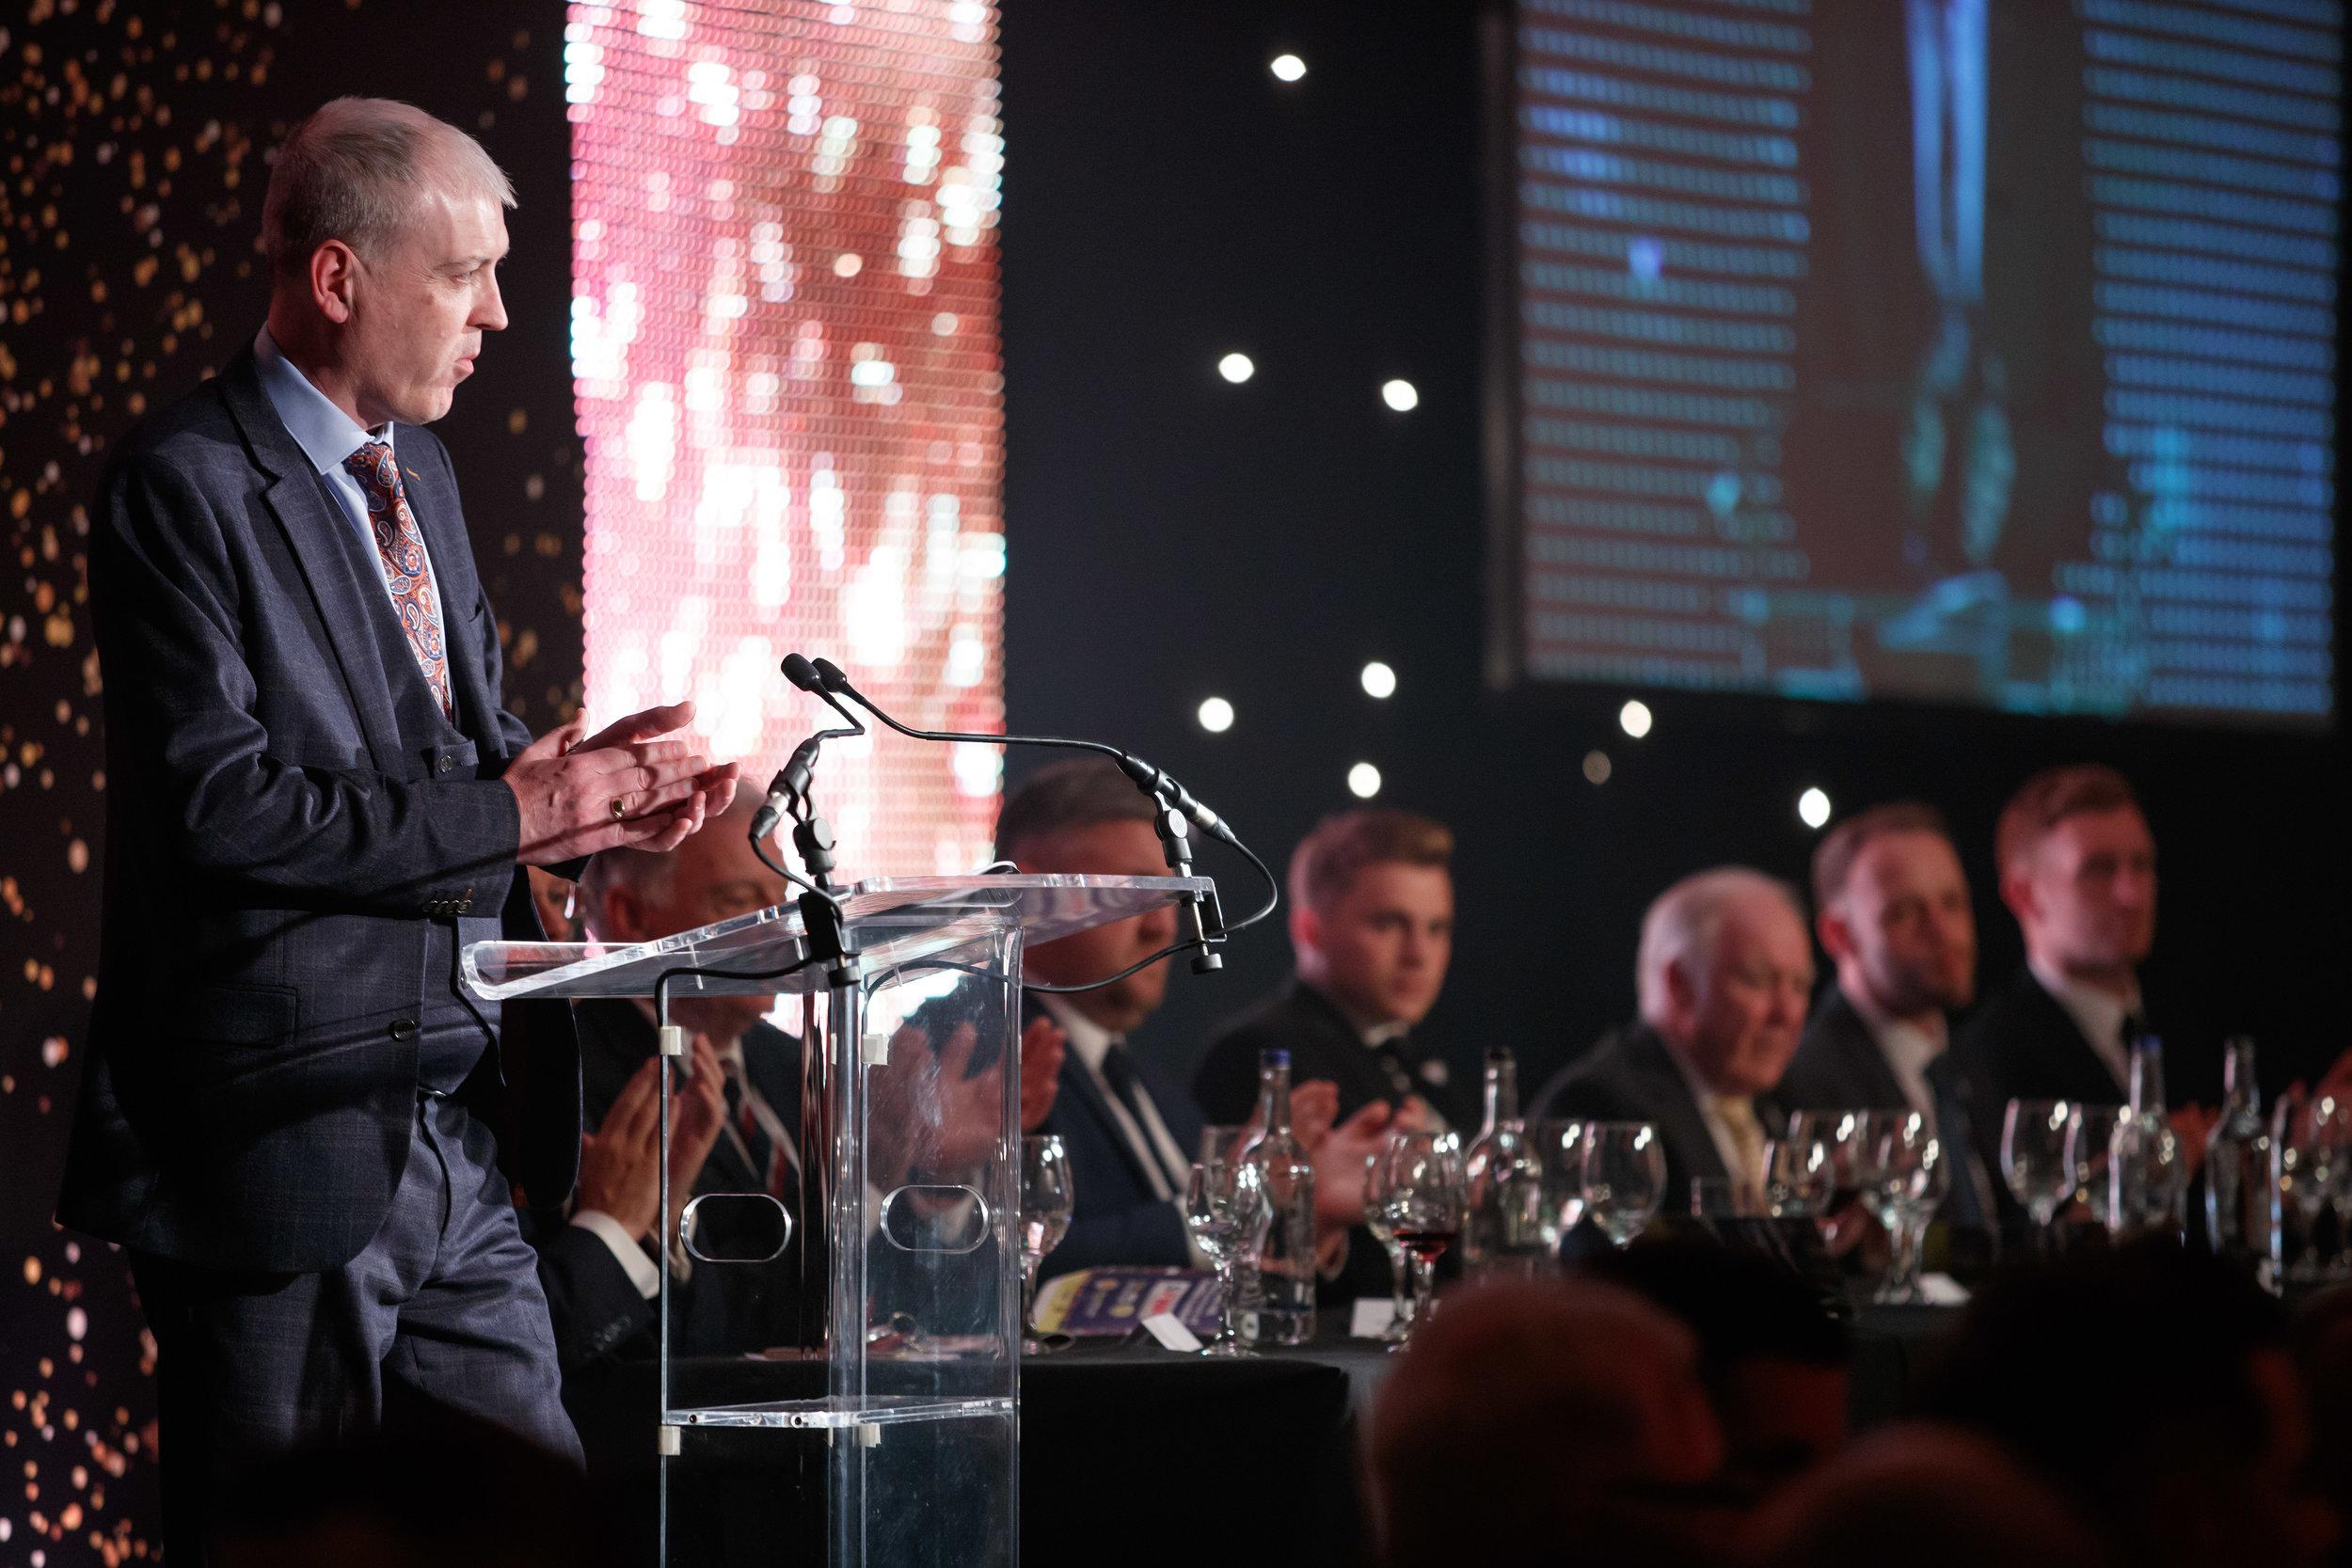 Stephen Halliday has ended hiis three years as SFWA president